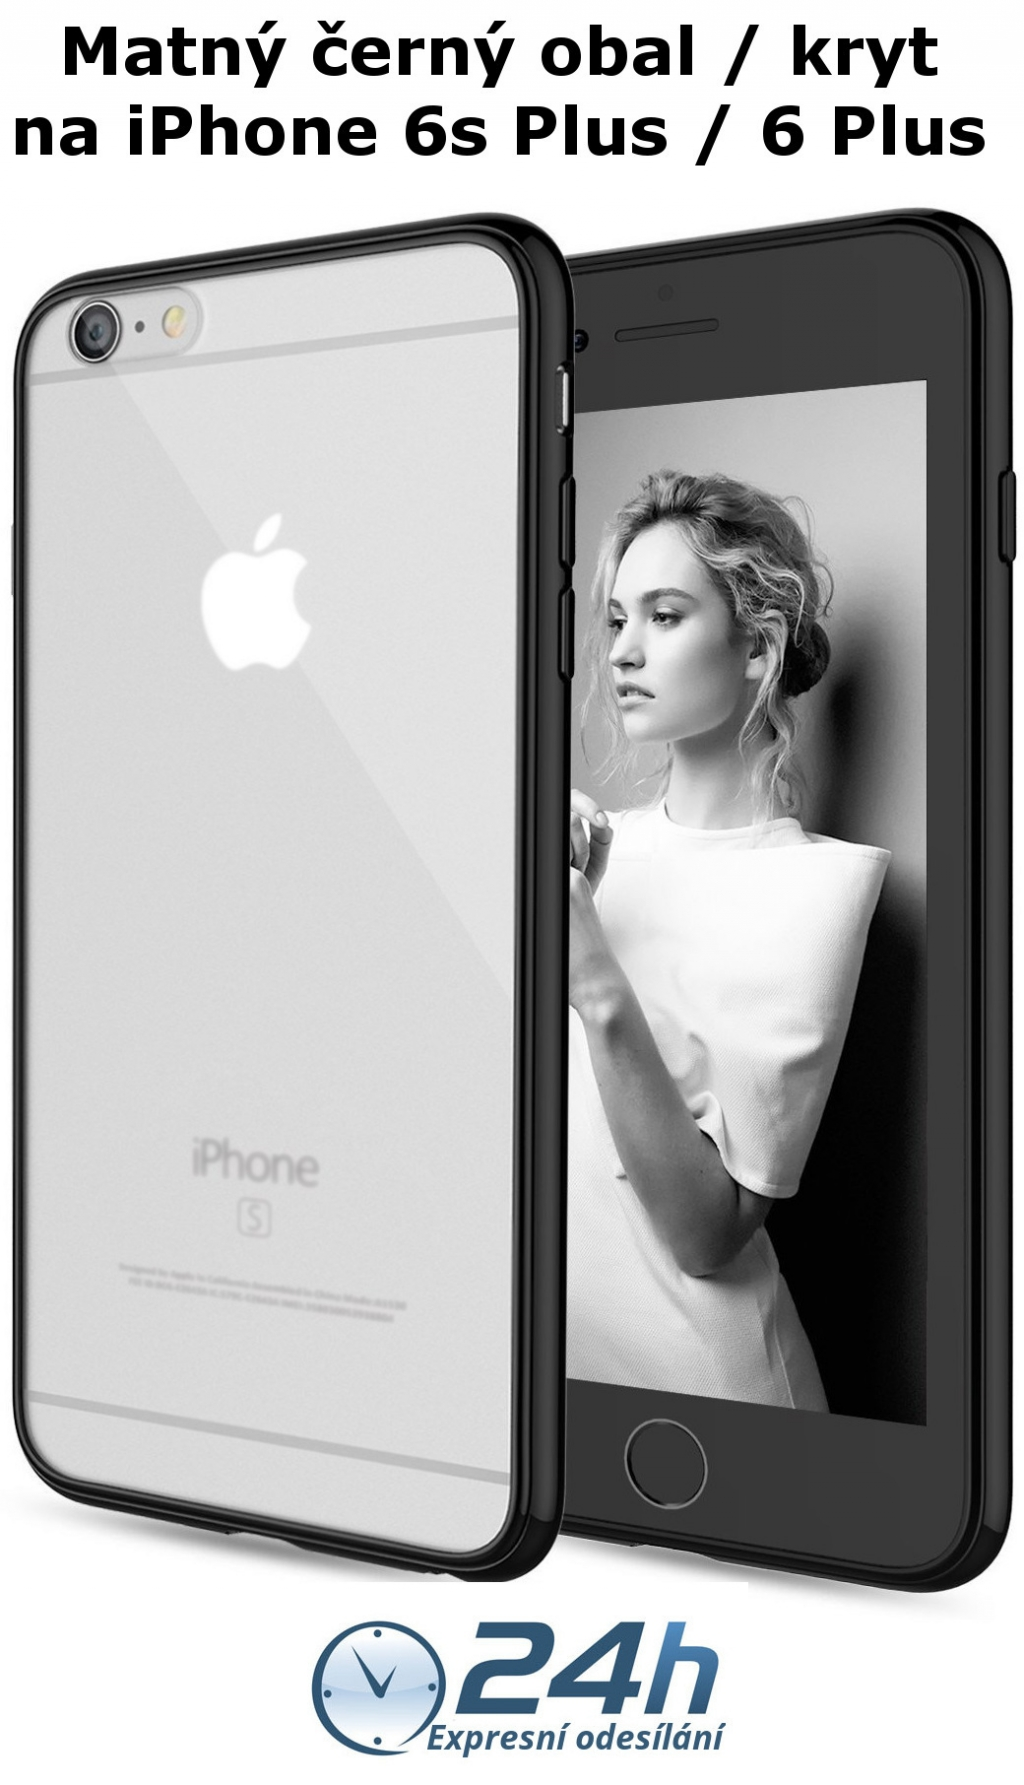 Černý matný kryt Shadow Hybrid na iPhone 6s Plus / 6 Plus